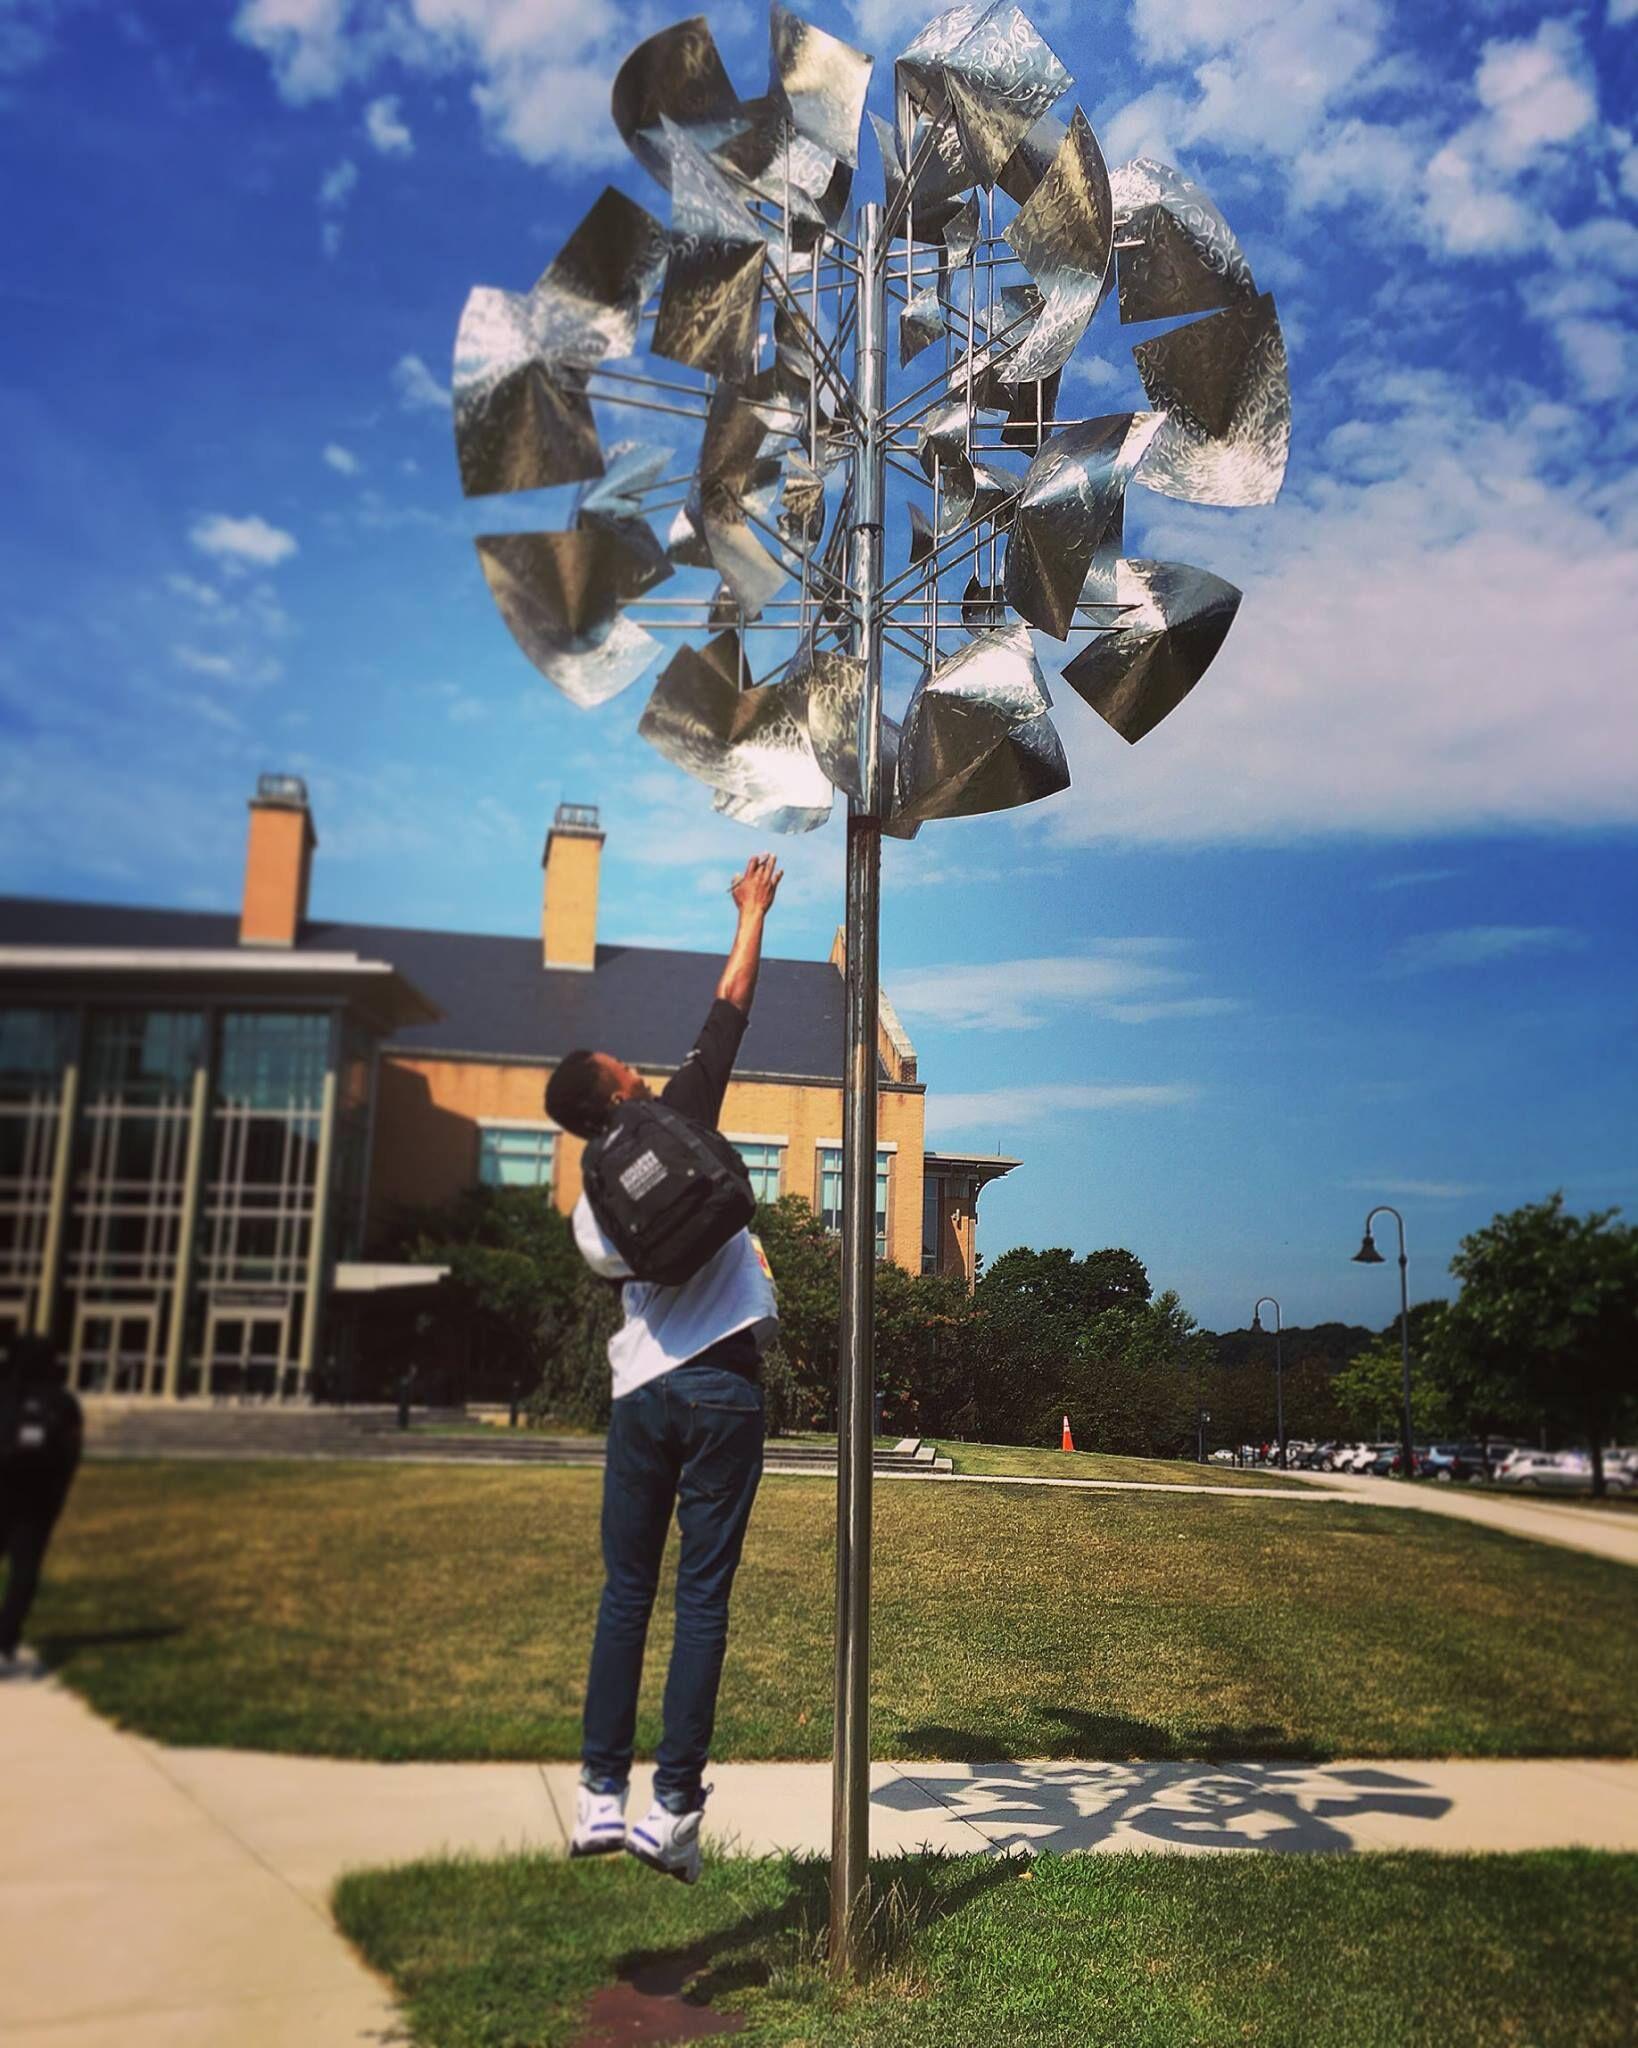 College Success Foundation - DC scholars tour Gettysburg College in Gettysburg, Pennsylvania. (Courtesy photo)